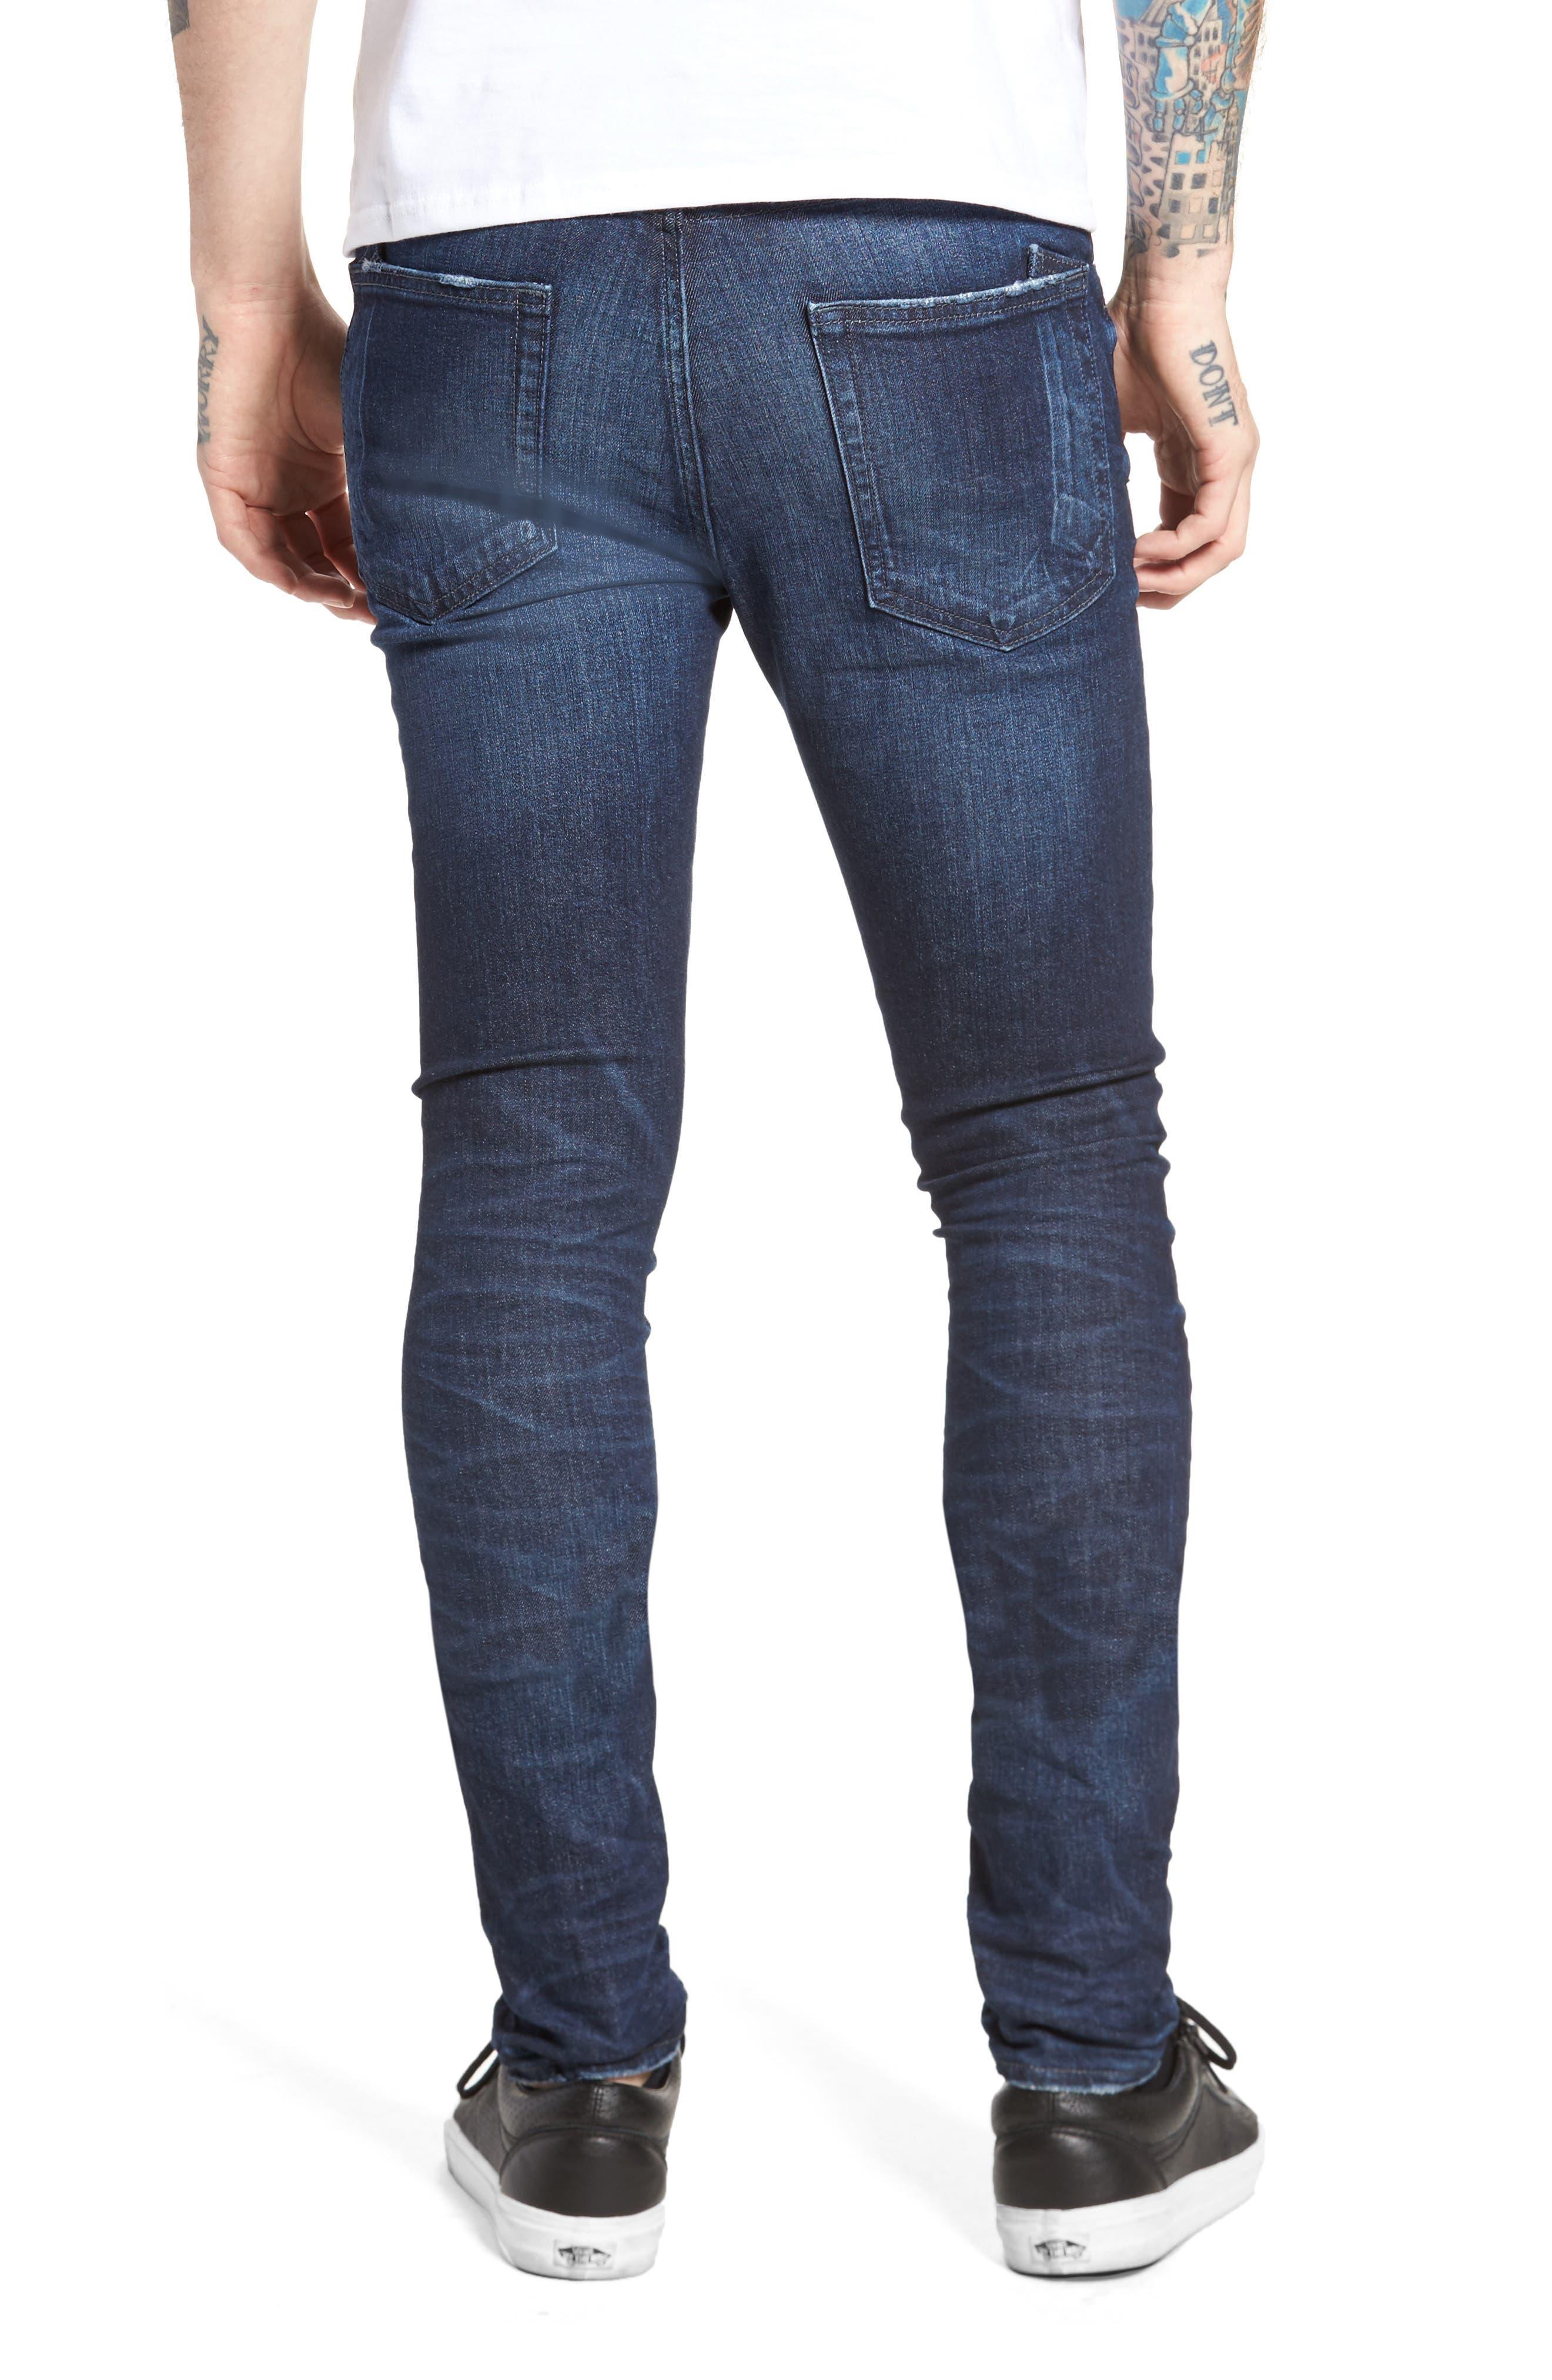 Windsor Slim Fit Jeans,                             Alternate thumbnail 2, color,                             Dark Blue